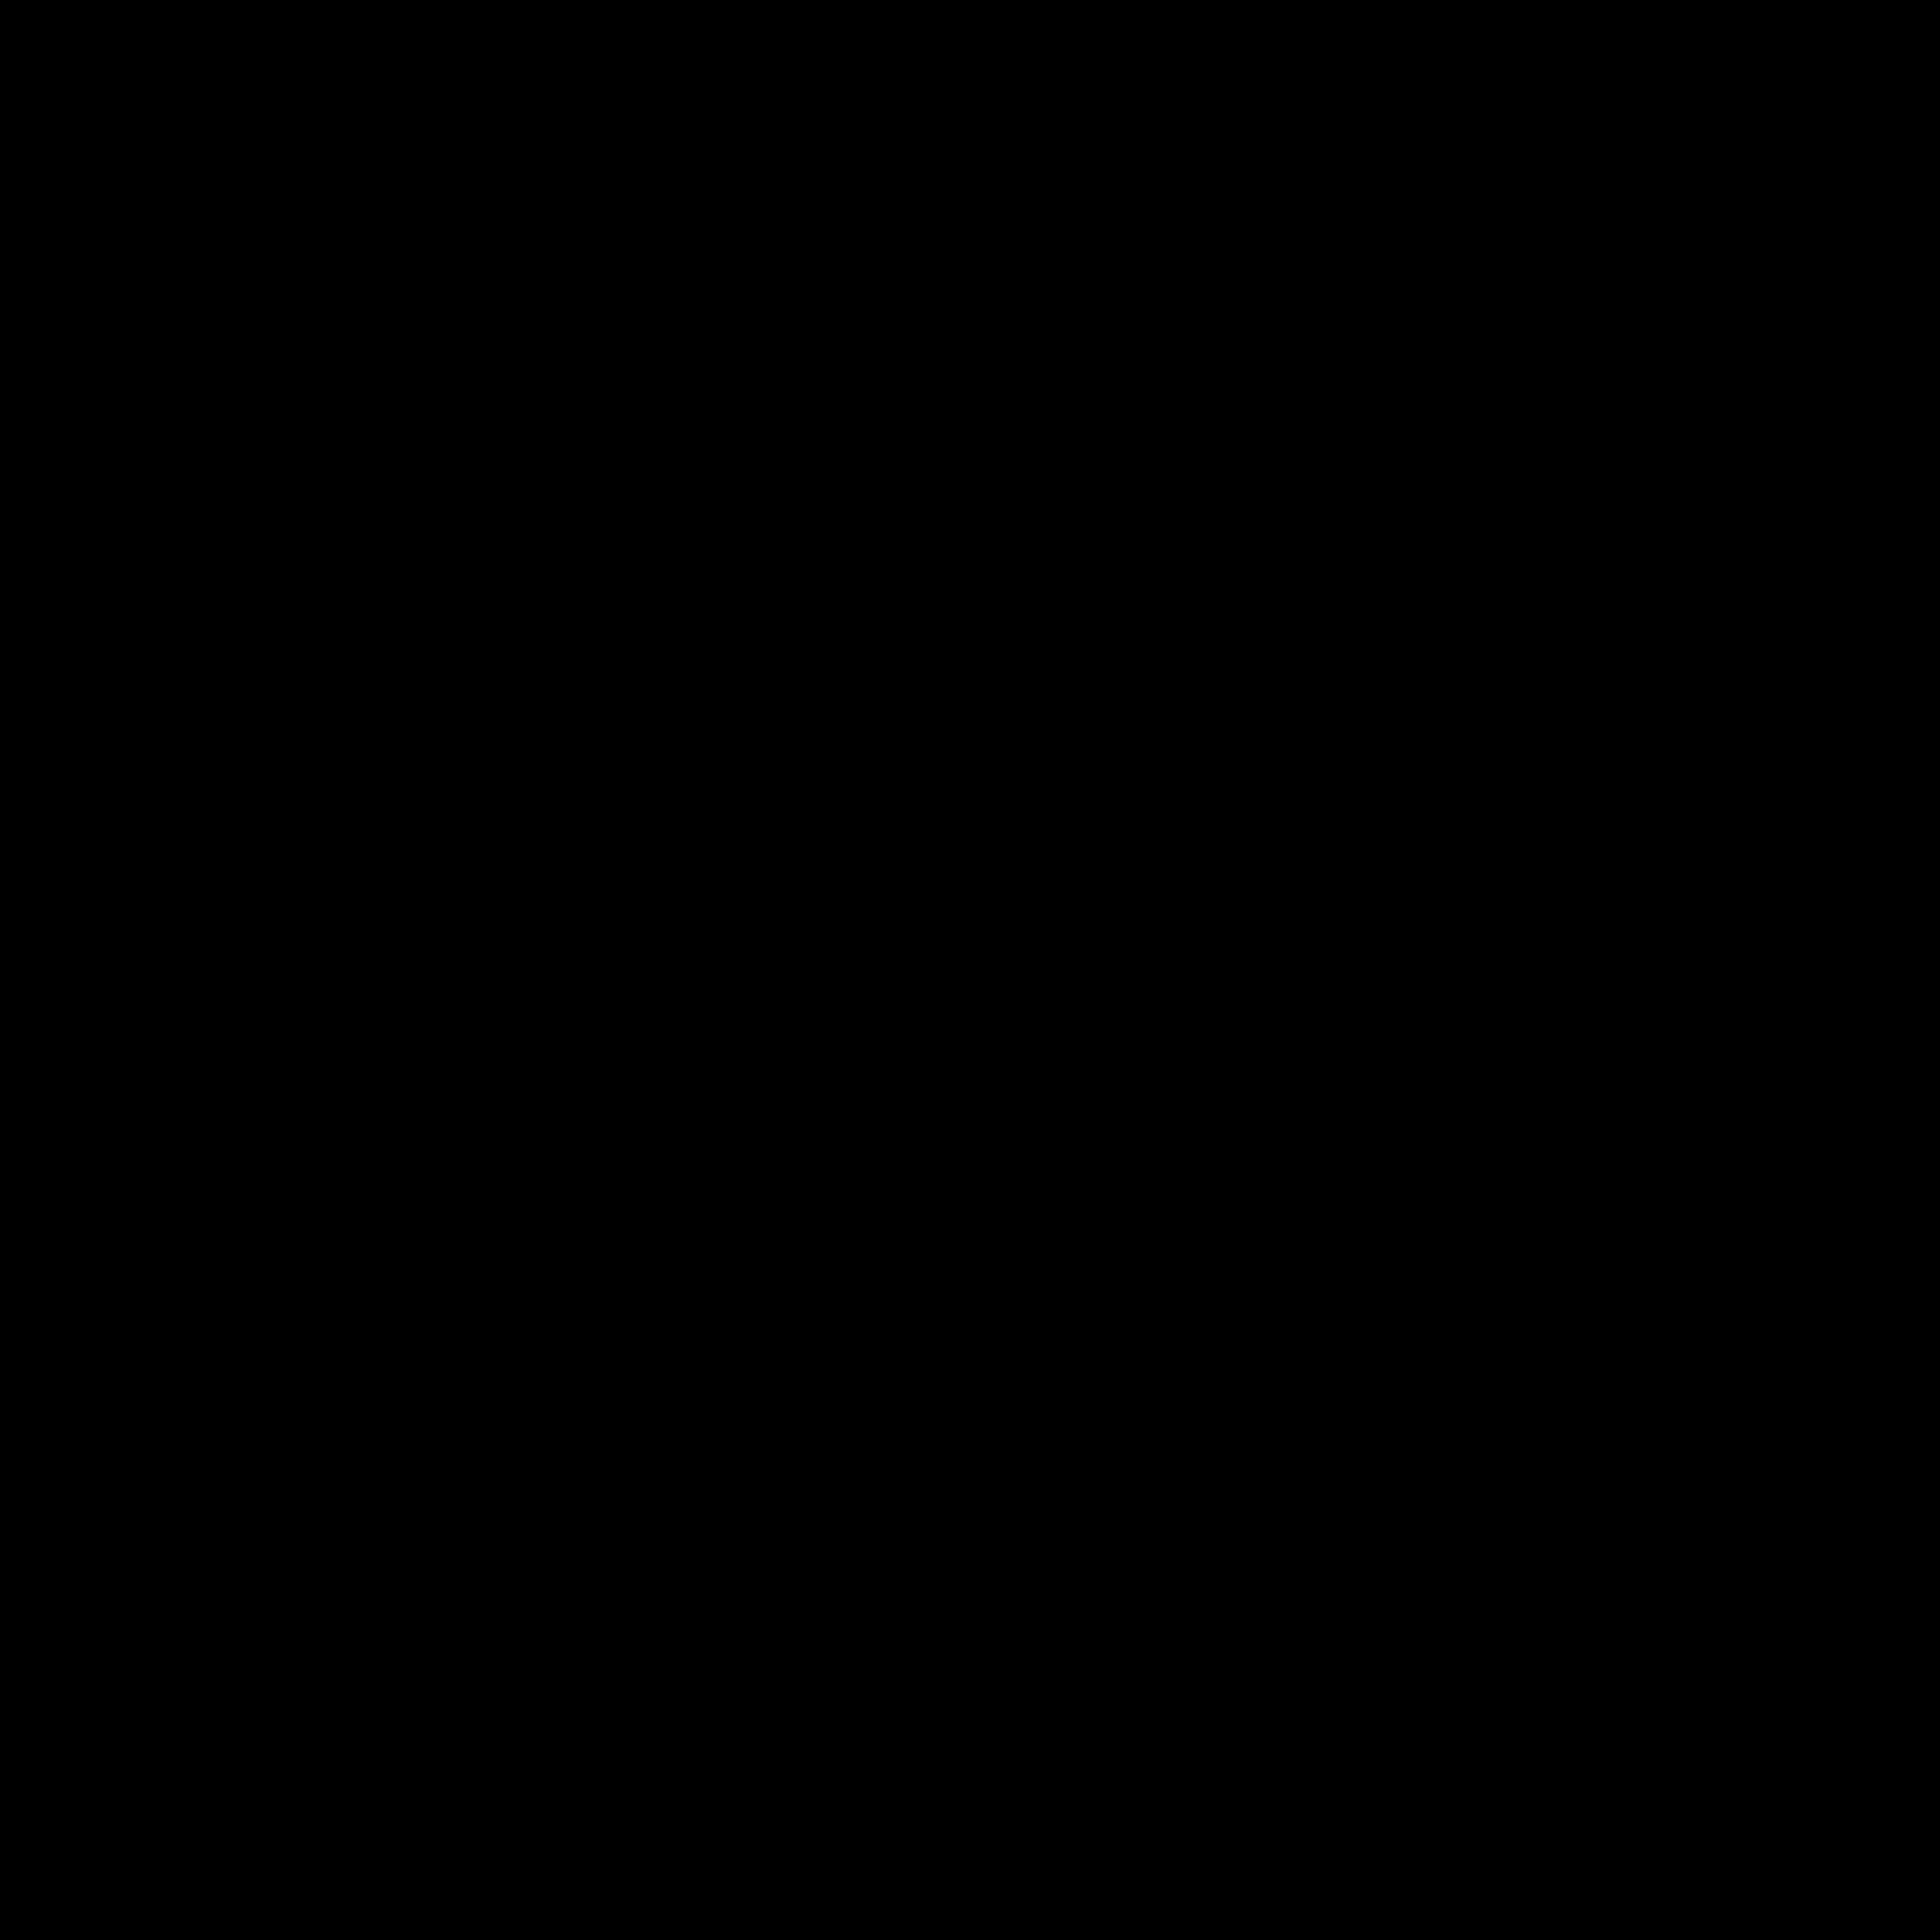 konbini-square.png